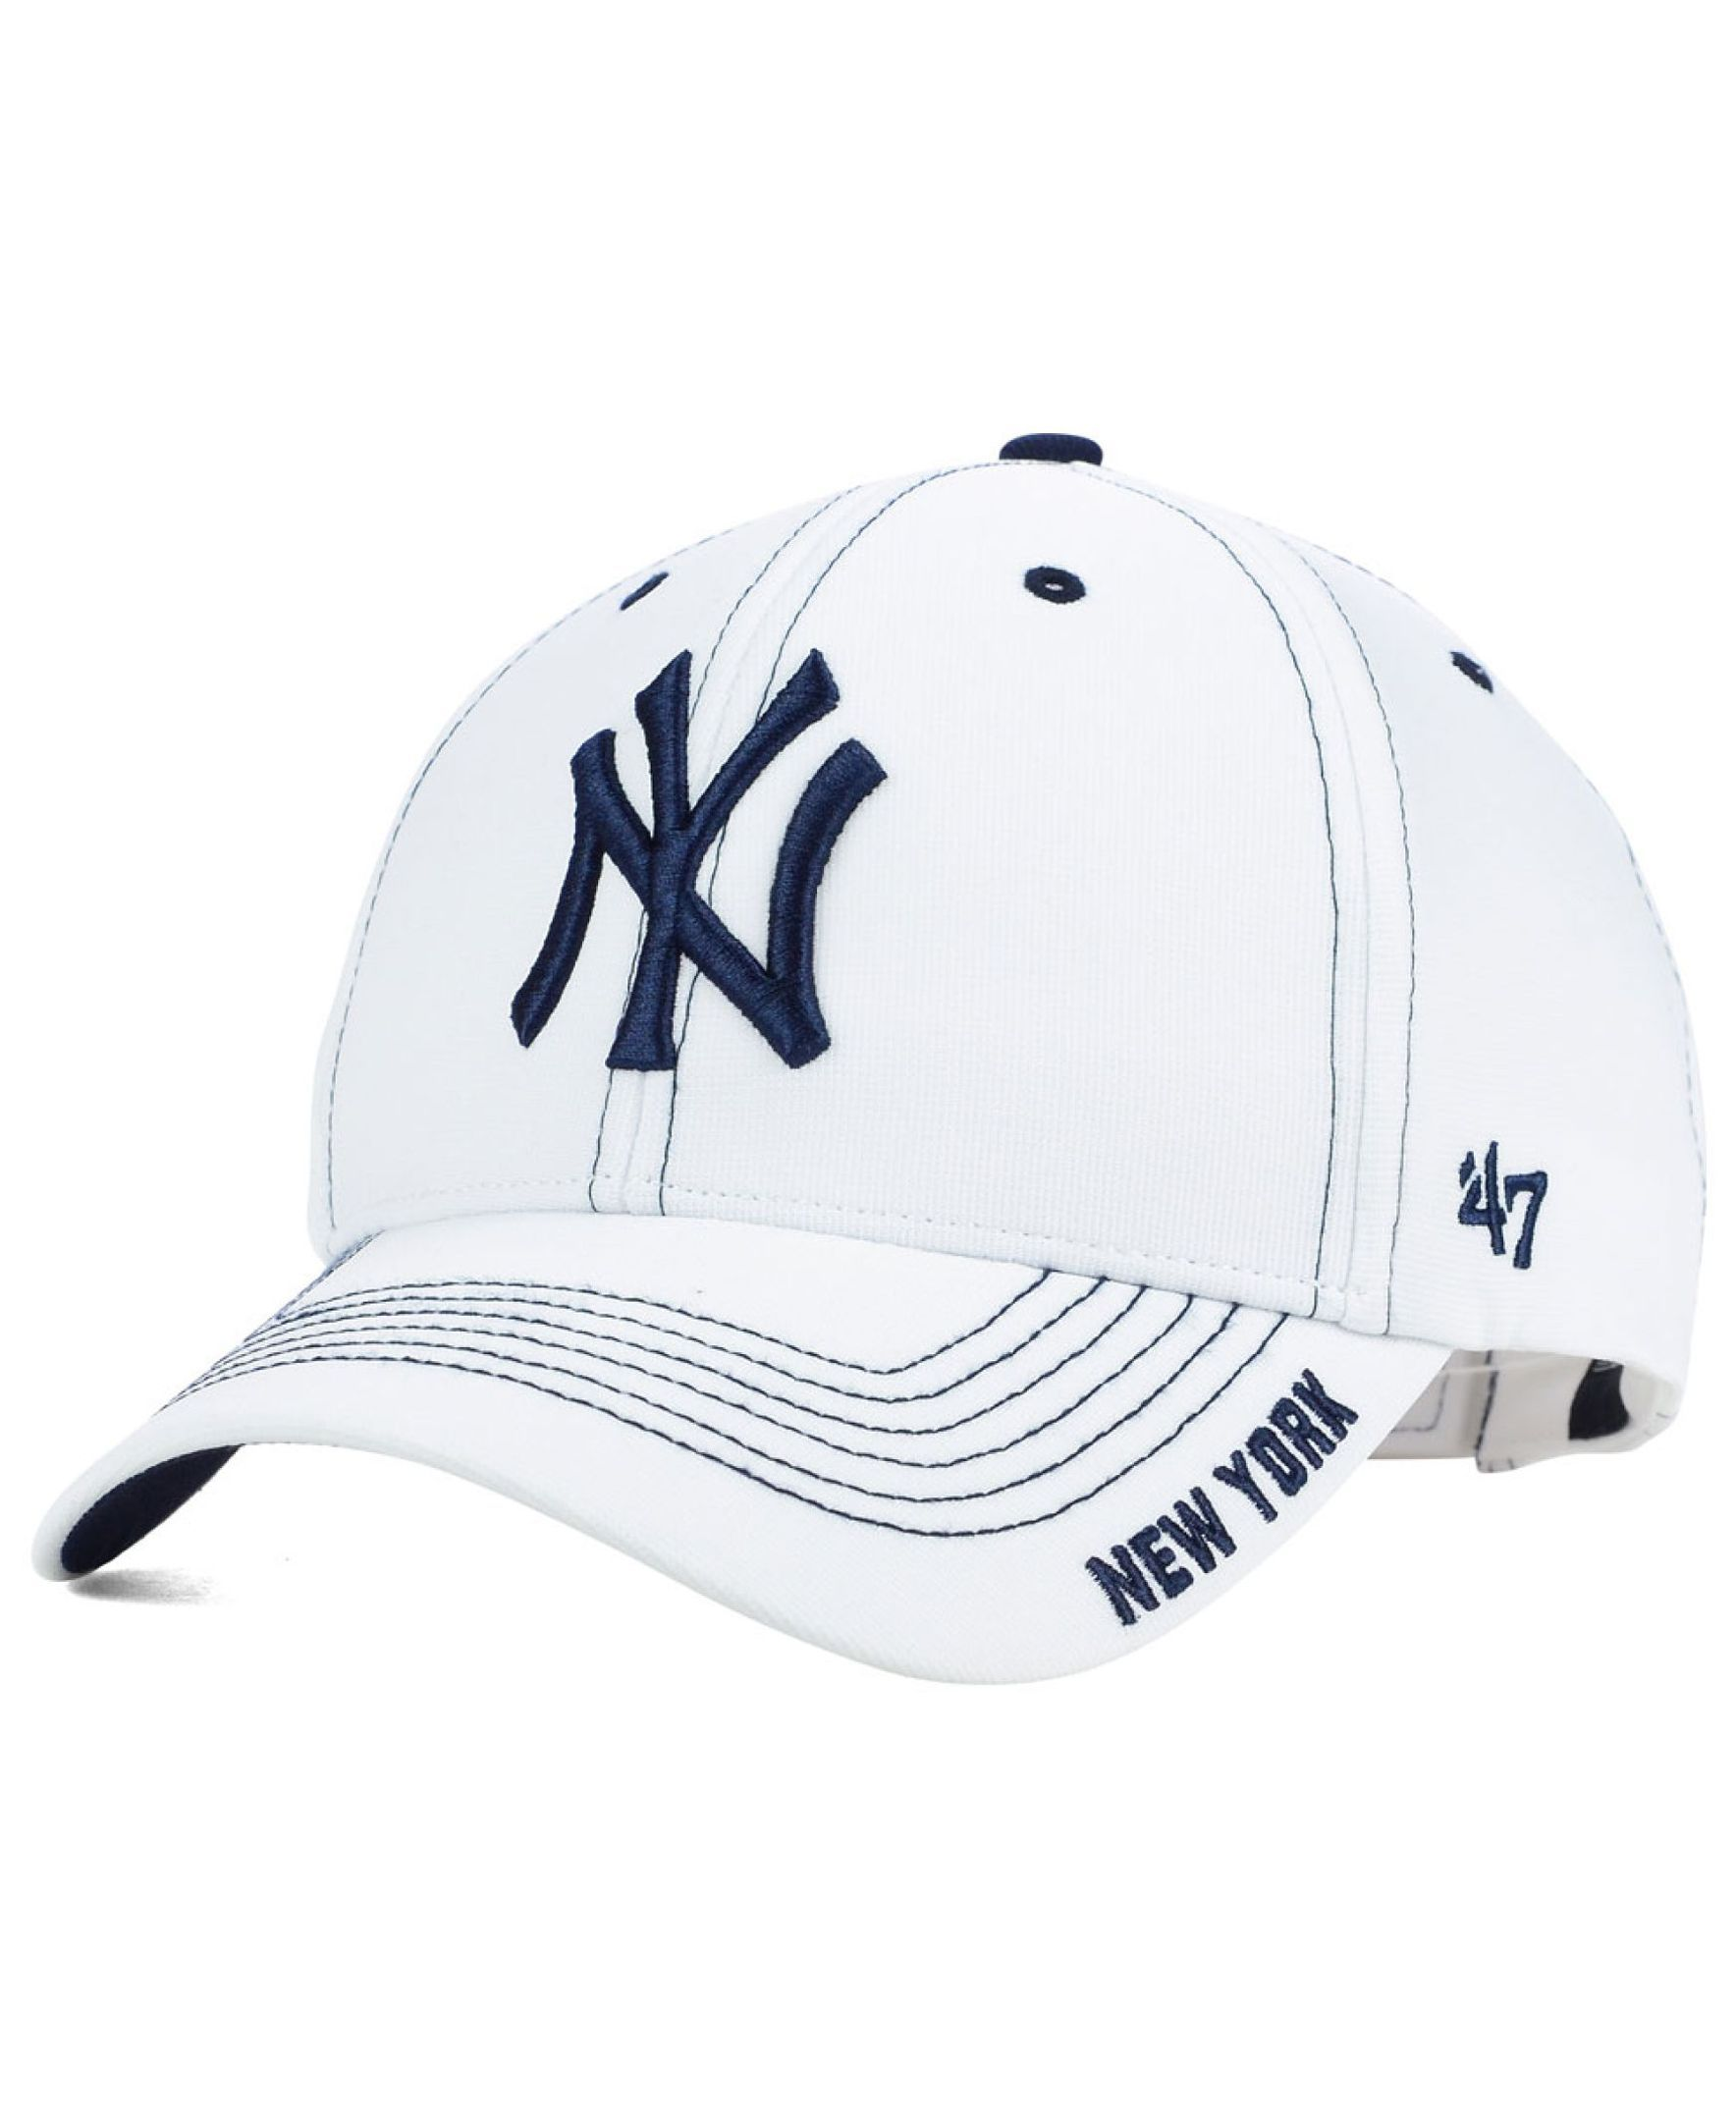 d541b6c2fc6 ... cheapest 47 brand new york yankees adjustable cap sports fan shop by lids  men macys c04fe ...